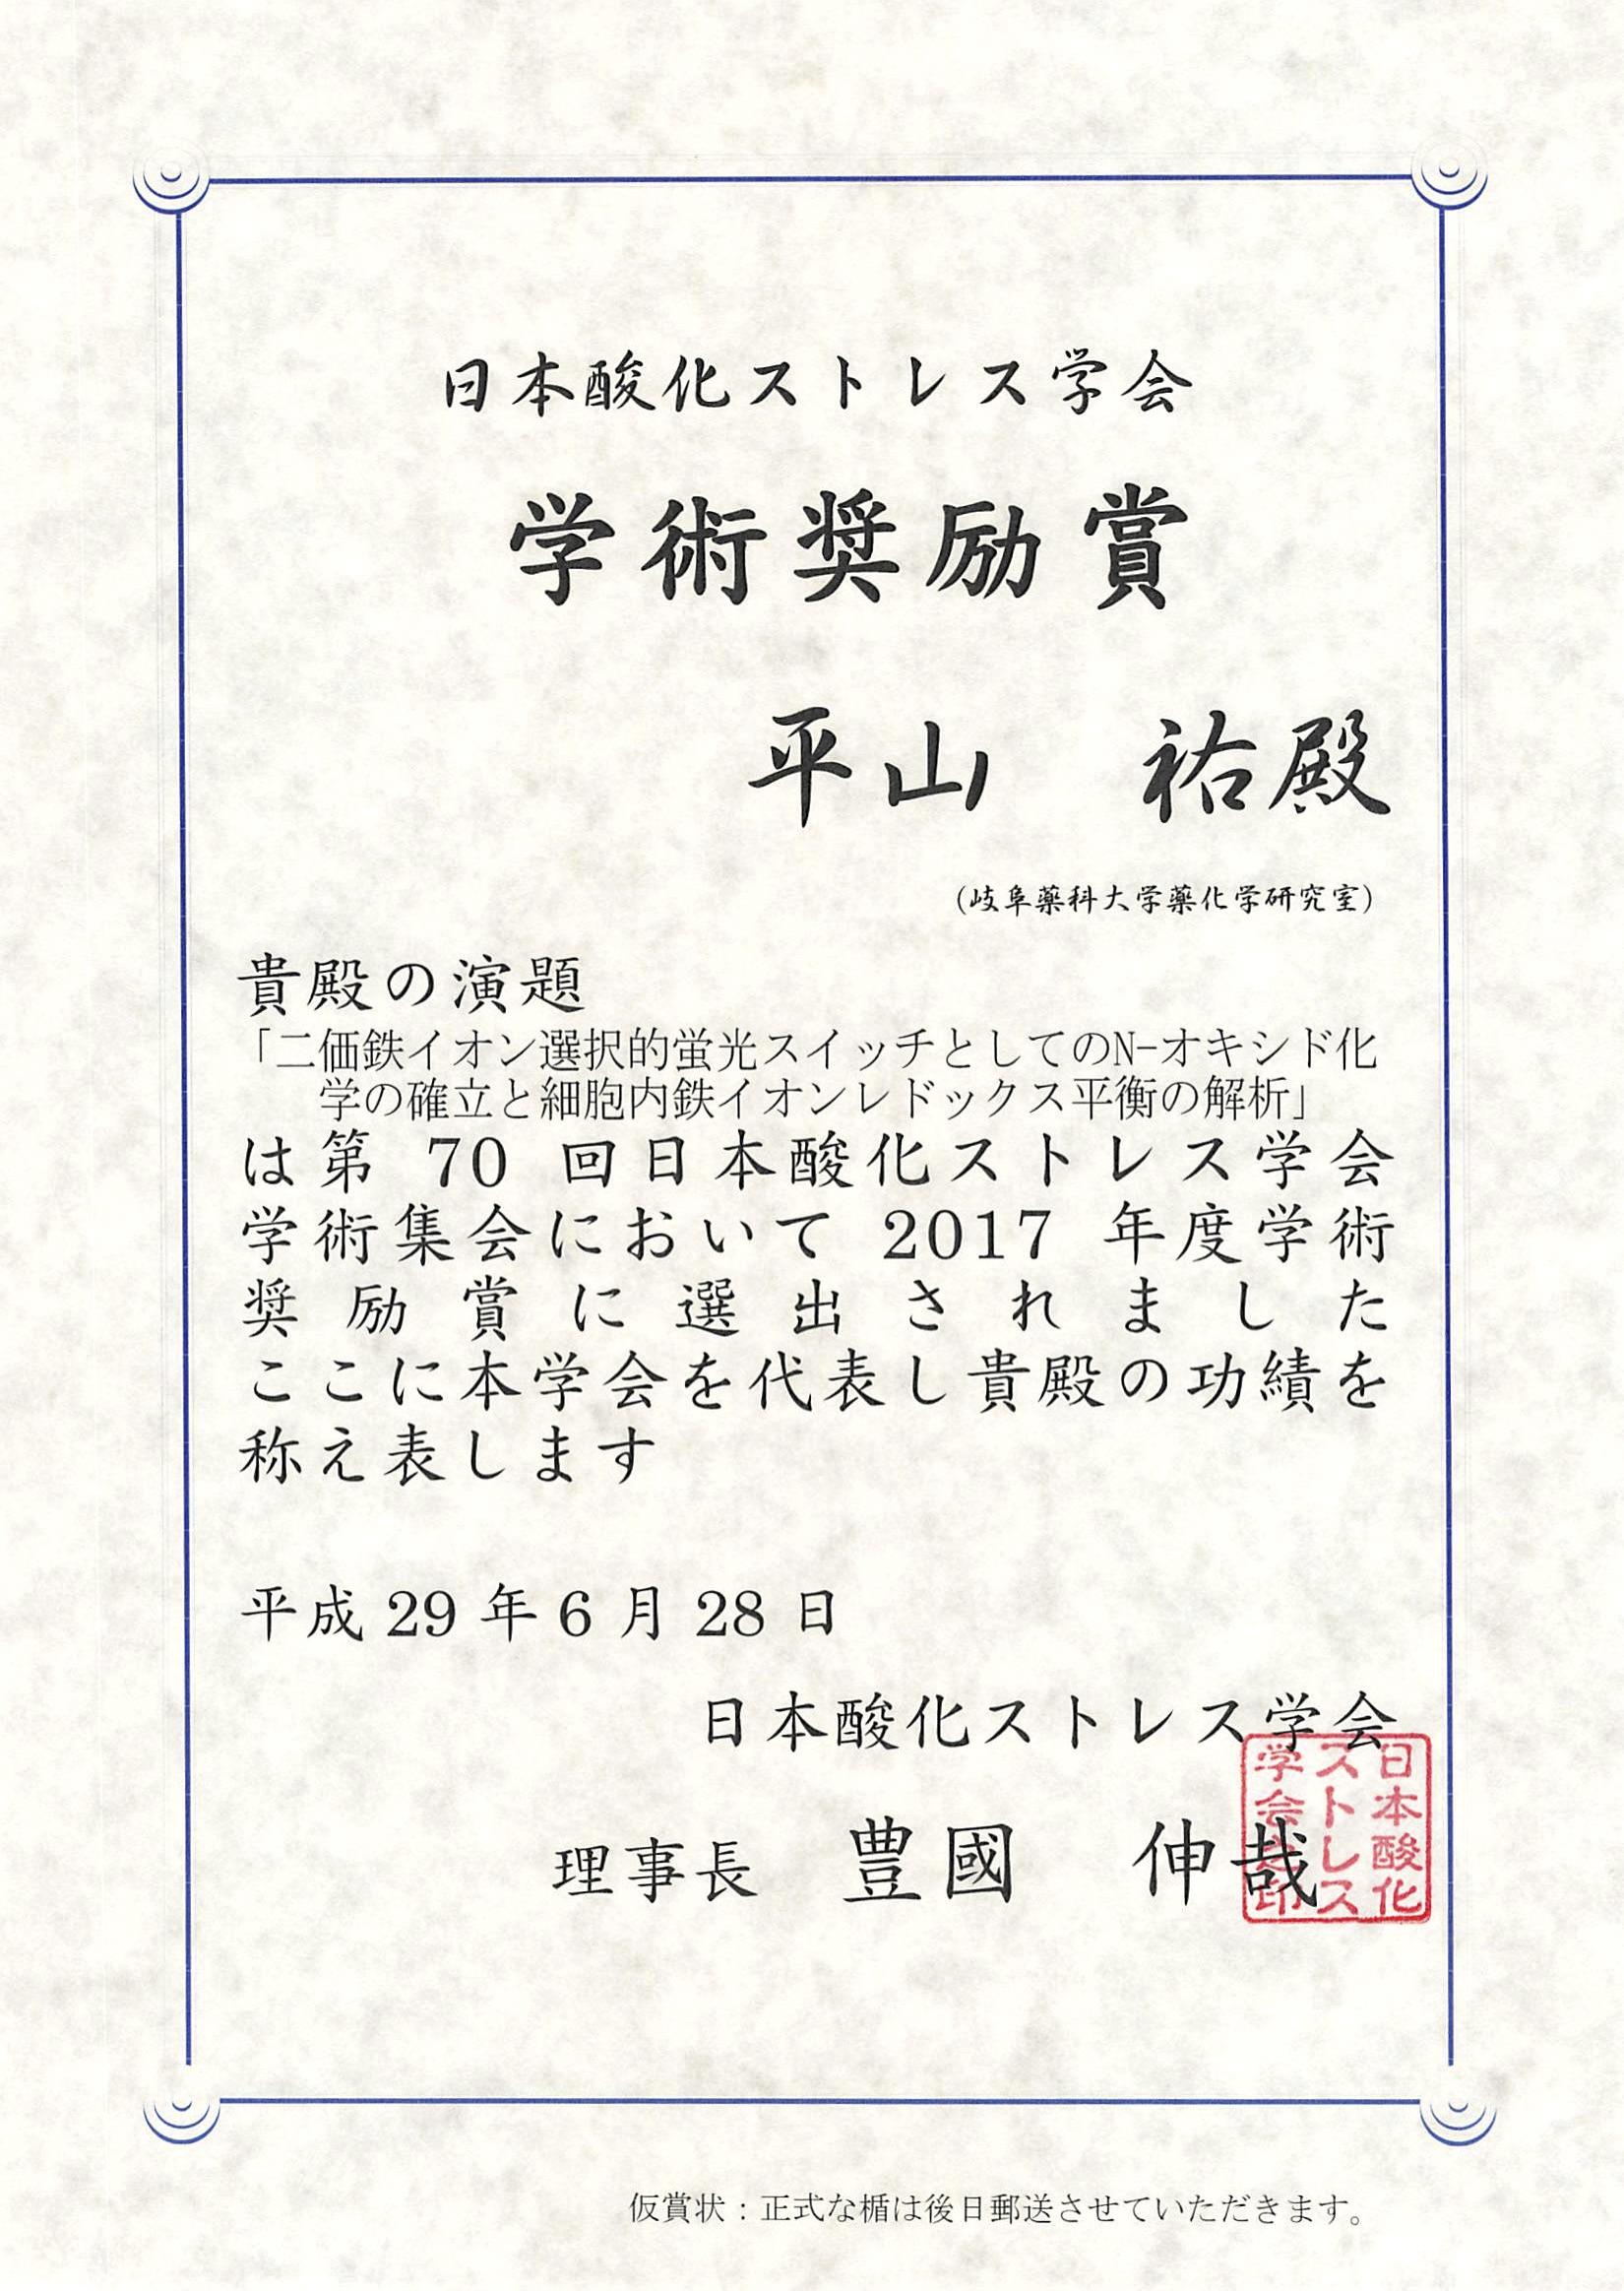 2017 Jun. 29 平山准教授が第70回日本酸化ストレス学会学術集会にて学術奨励賞を受賞しました。